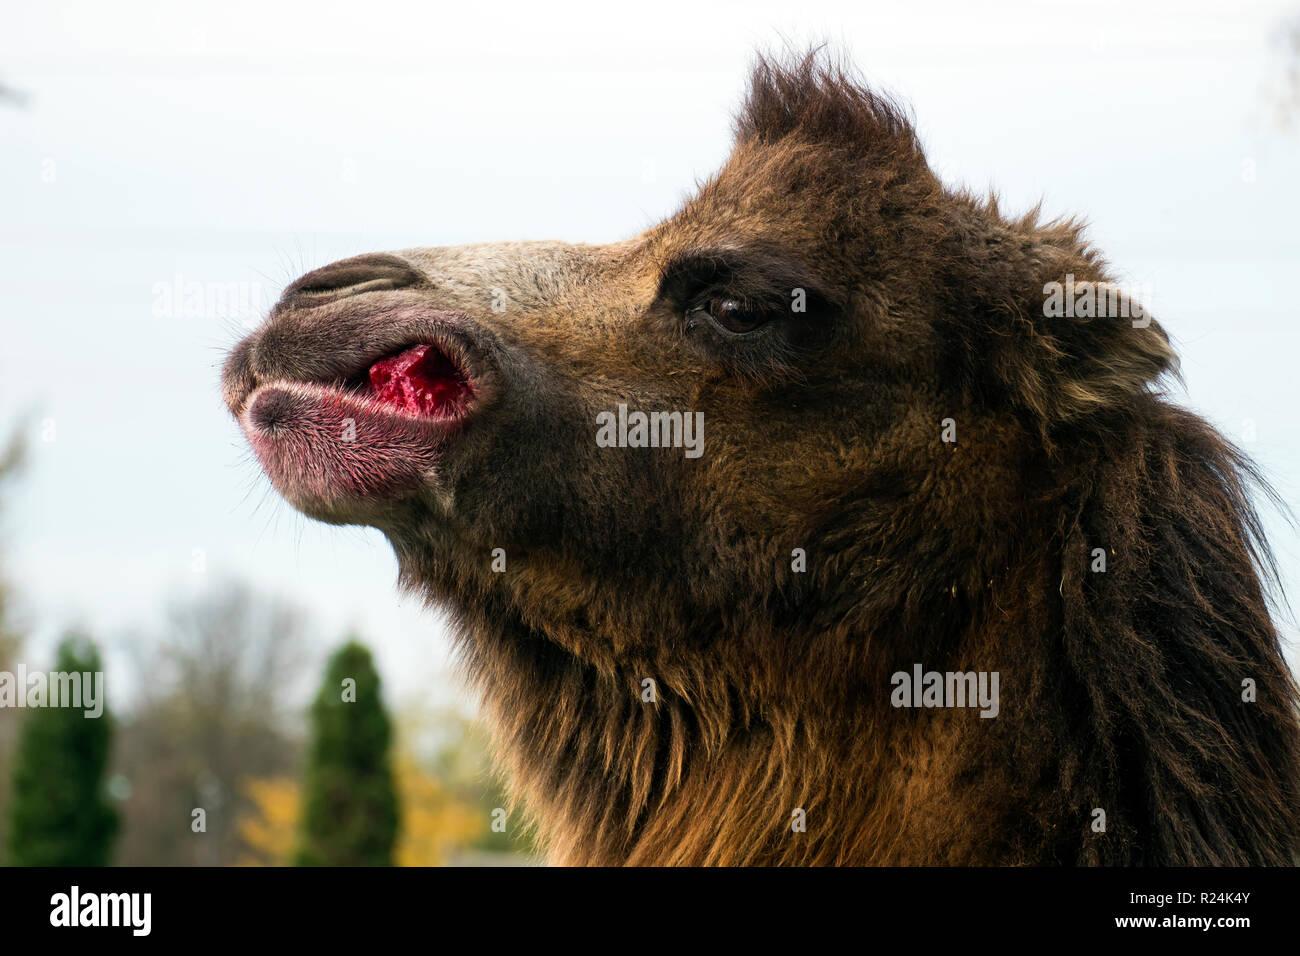 Bactrian camel chews sugar beet (Camelus bactrianus) - Stock Image